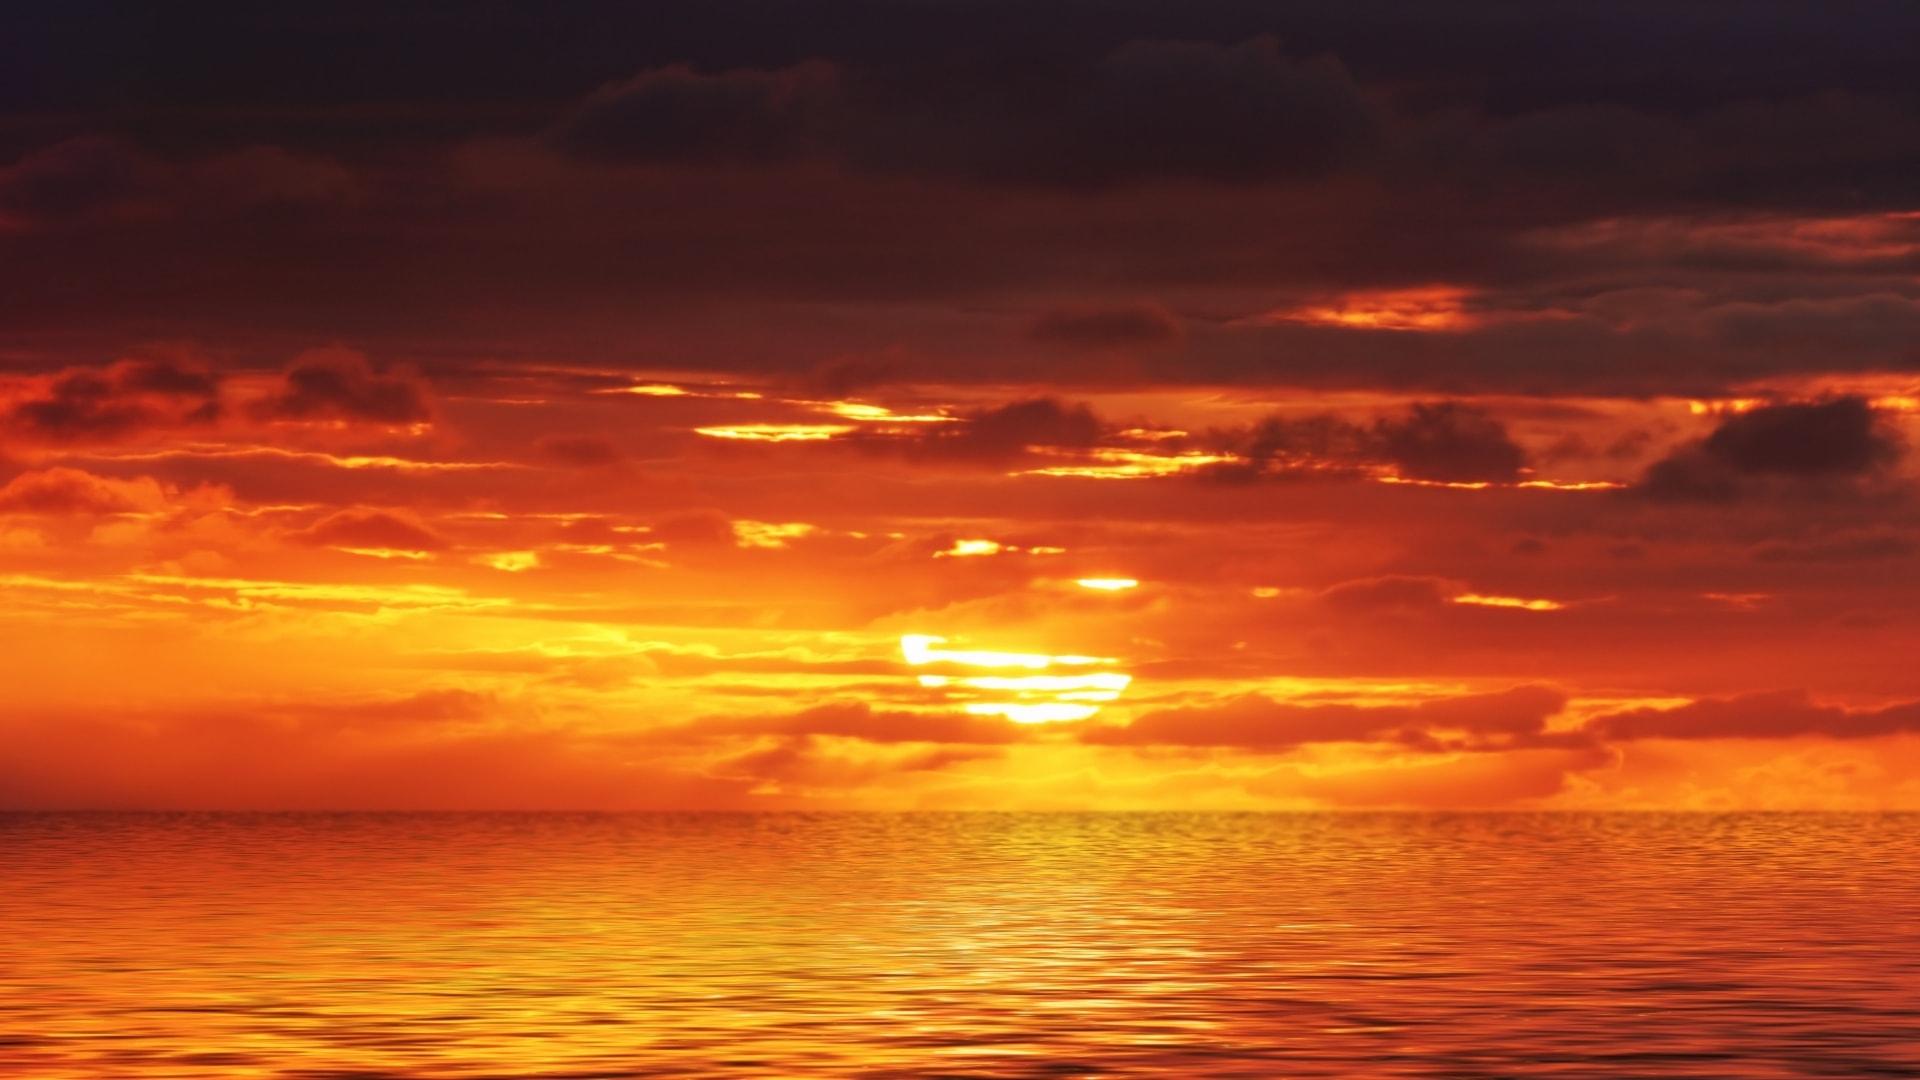 Sunset Screensavers